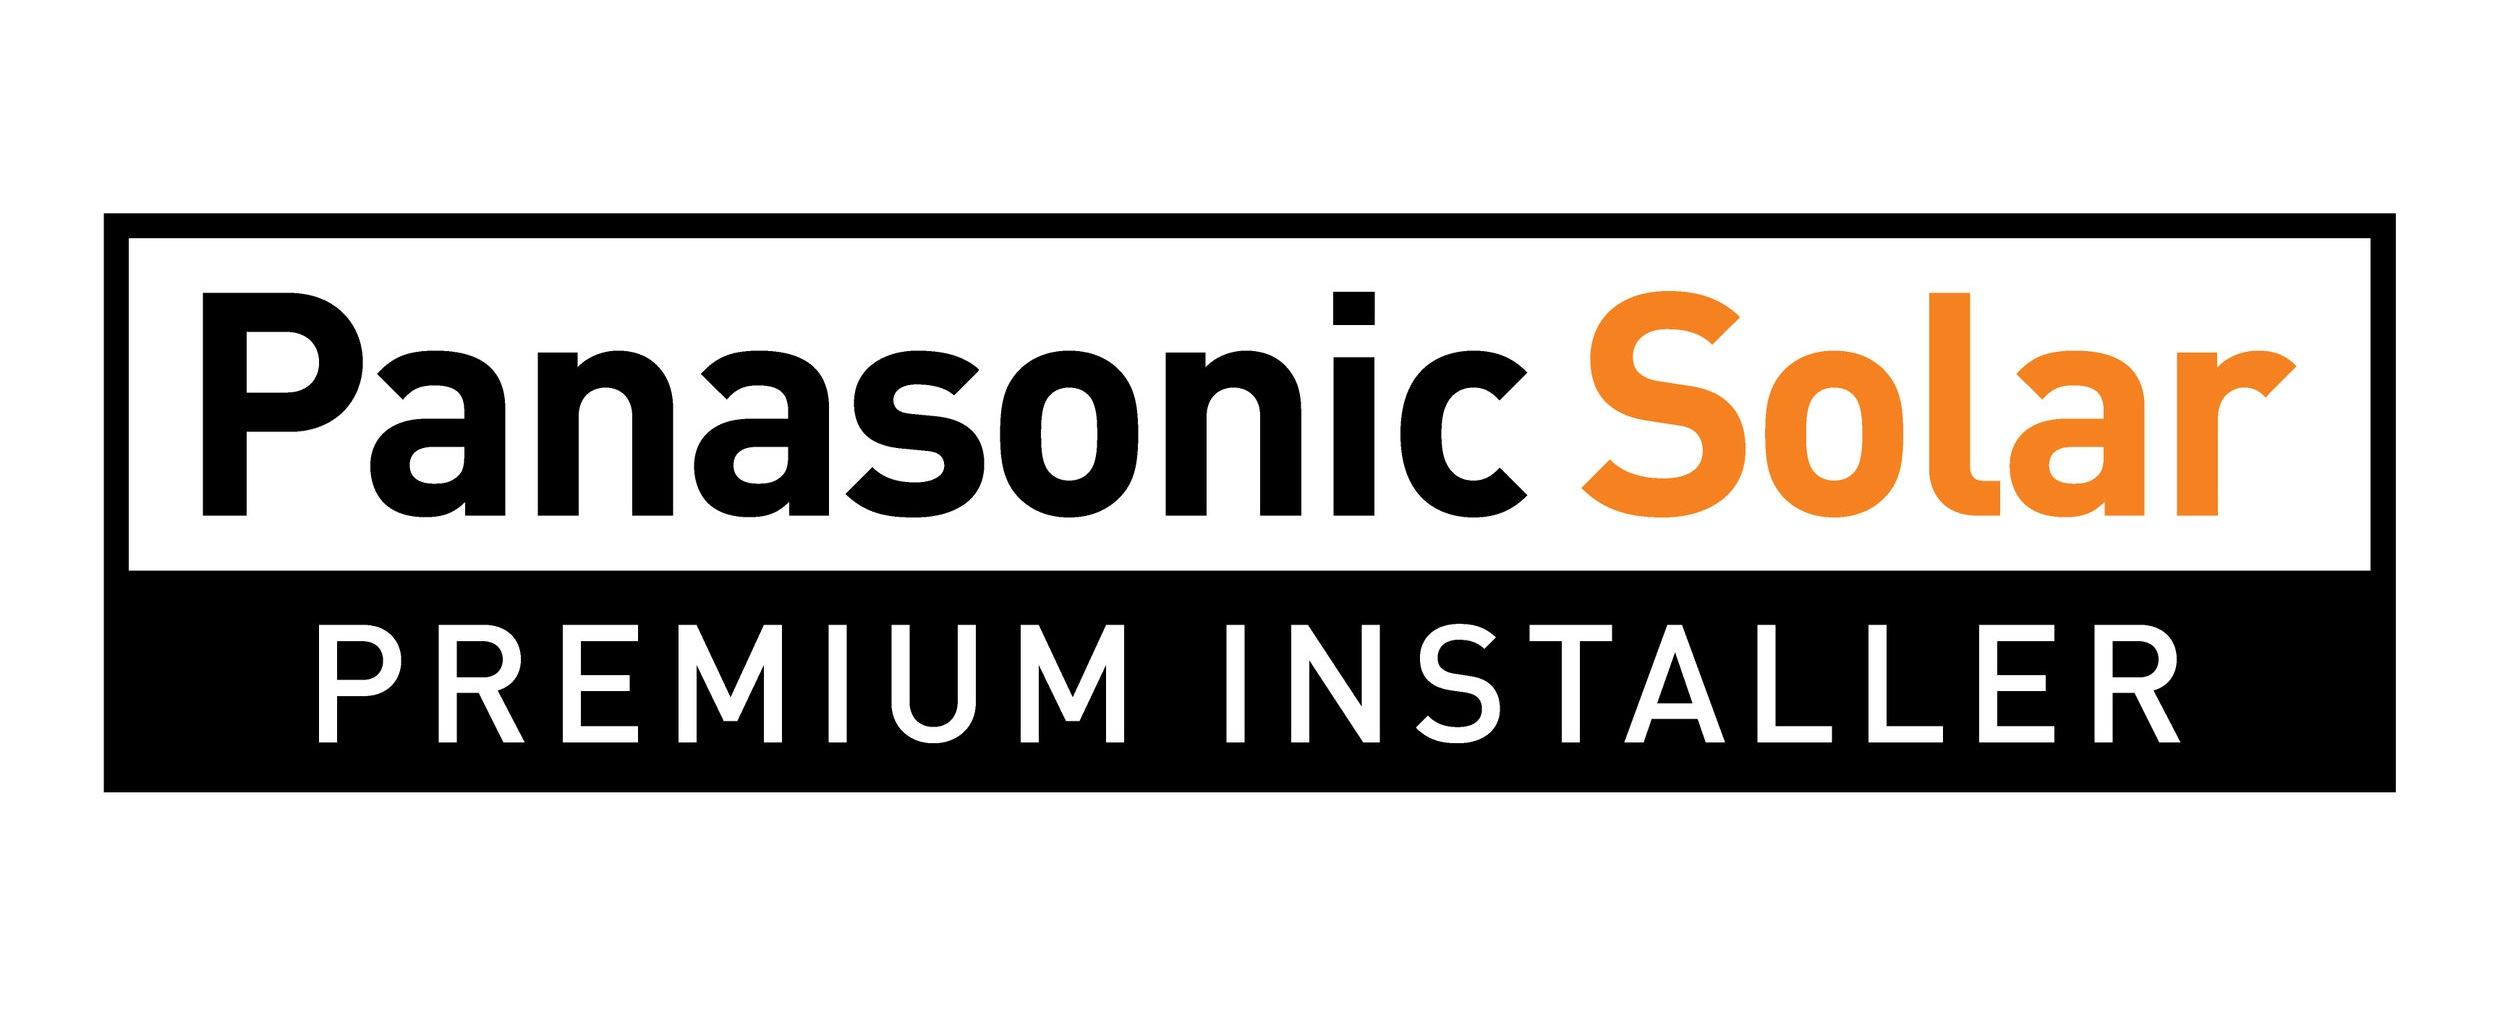 Panasonic+Solar+Premium+Installer+Logo.jpg